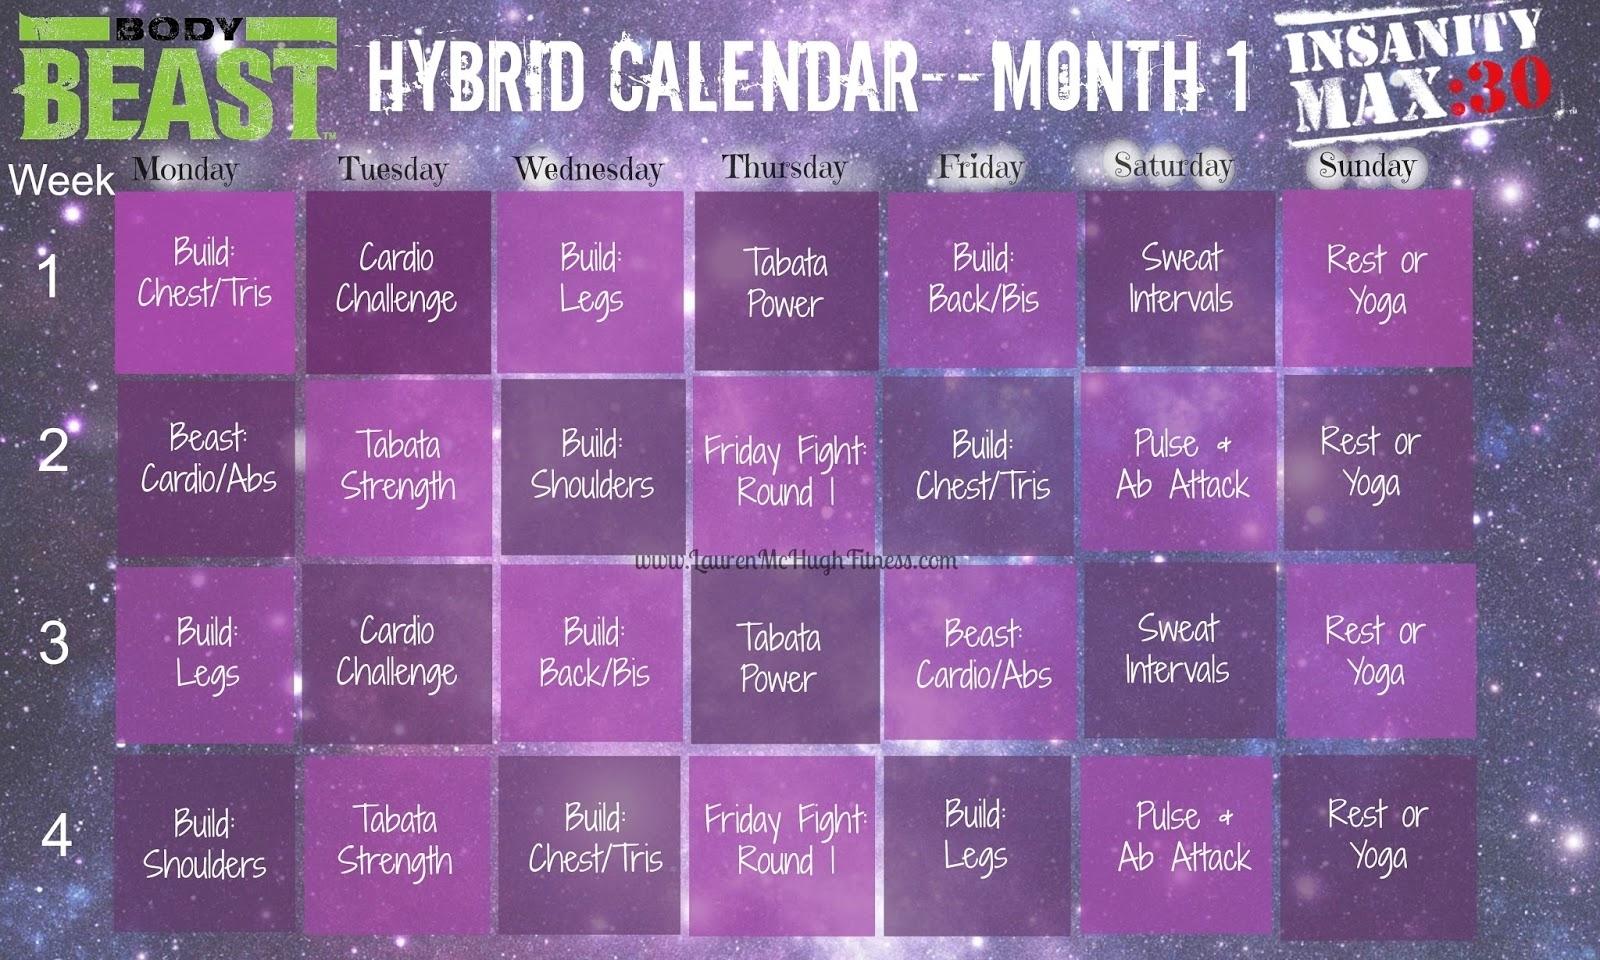 Insanity Max 30Piyo Hybrid Calendar  Calendar pertaining to Calendar Insanity Max 30